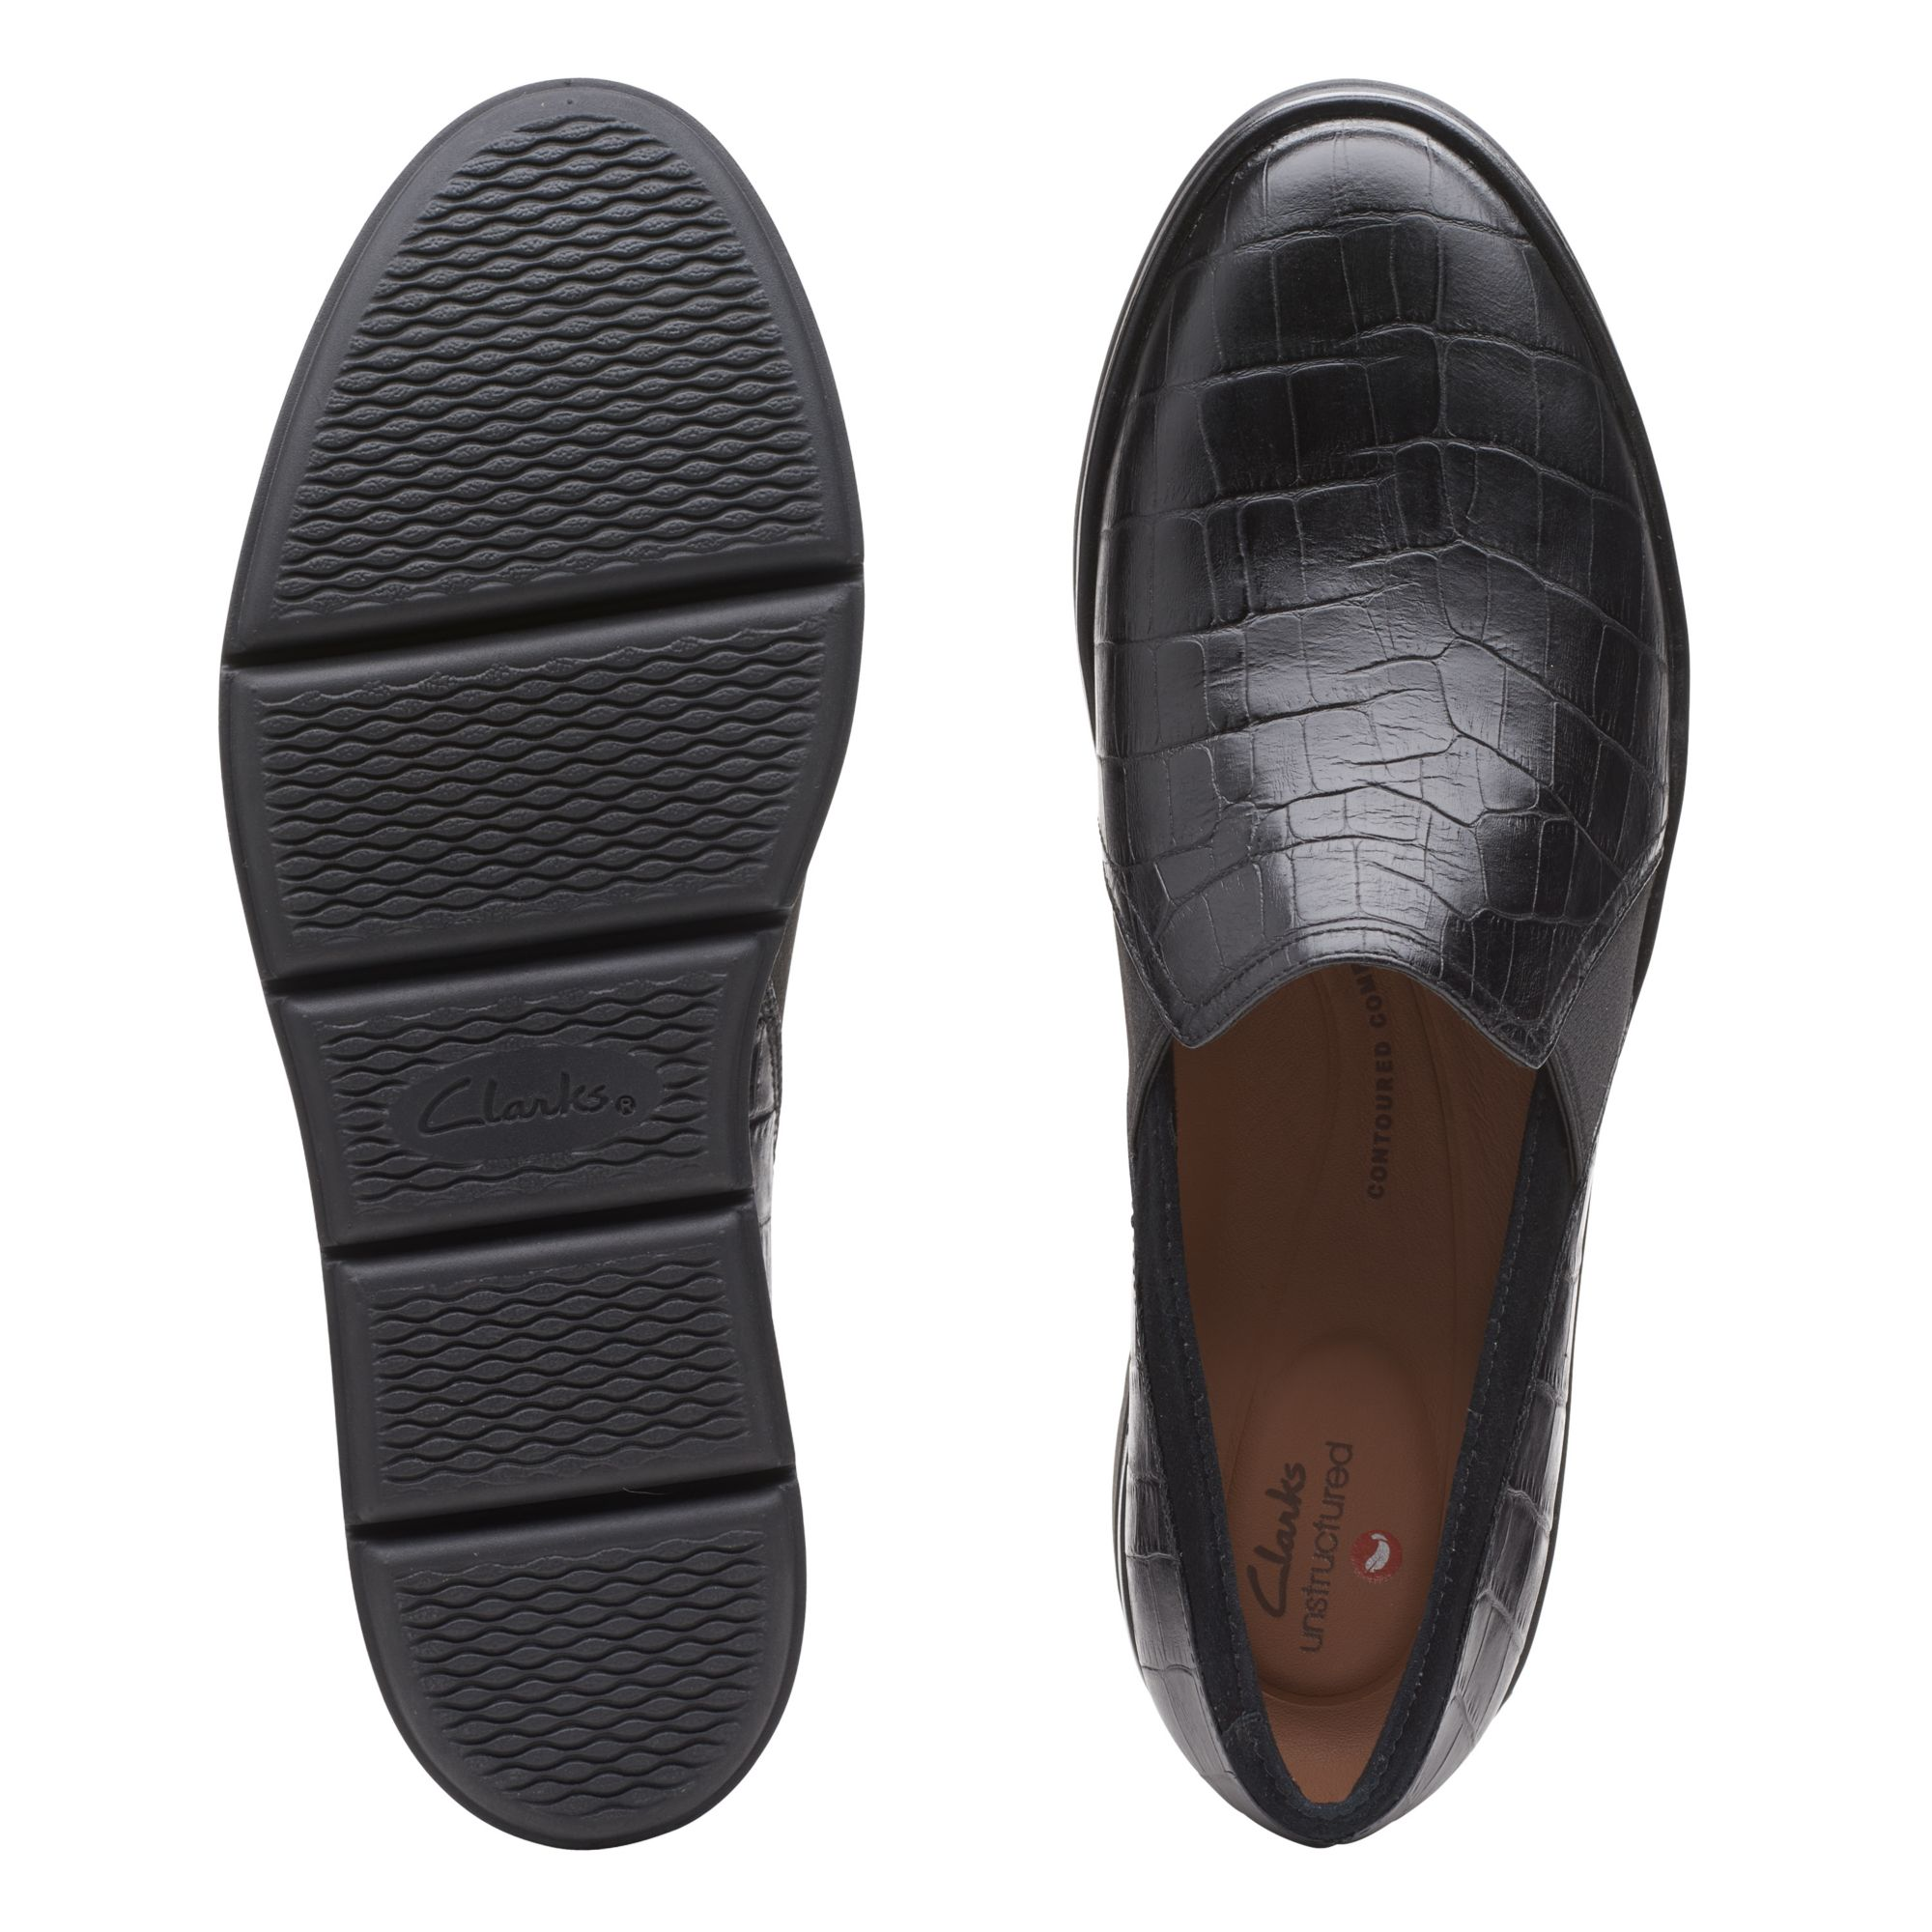 Дамски обувки Clarks Shaylin Ave Black Croc - снимка 7